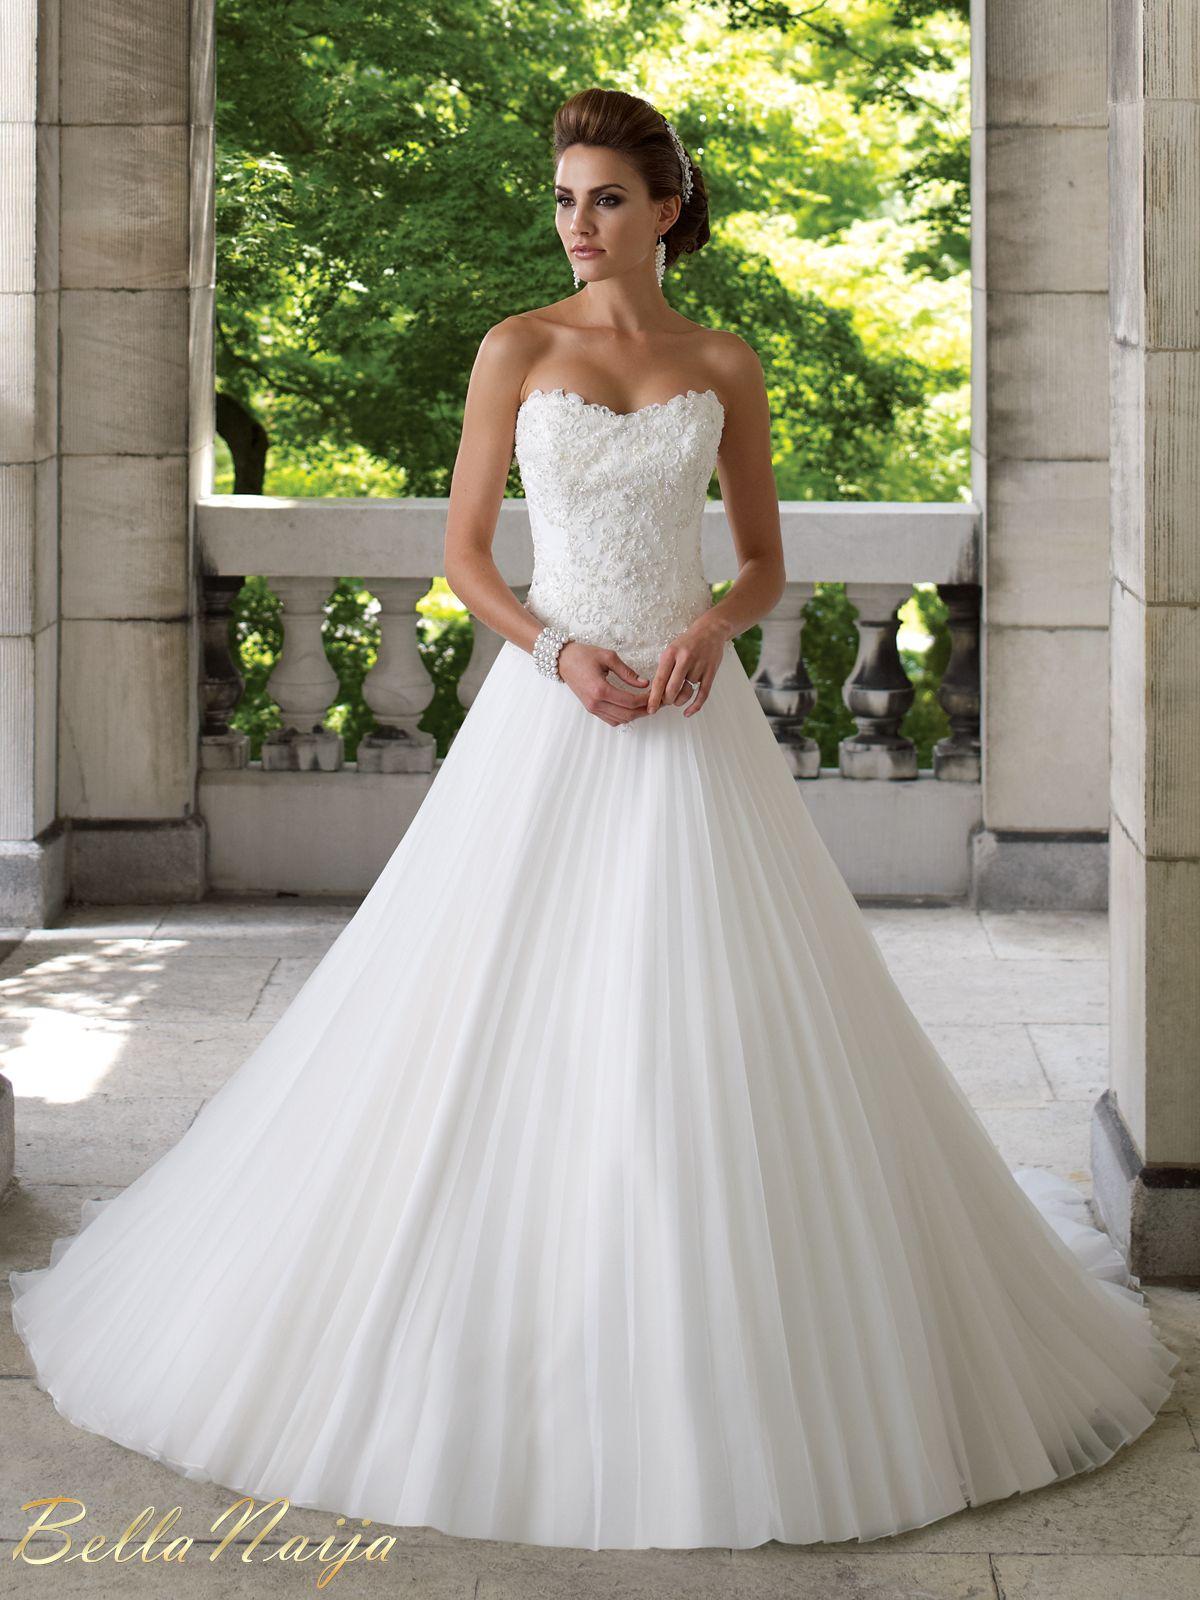 Bn Bridal David Tutera For Mon Cheri Spring 2013 Collection